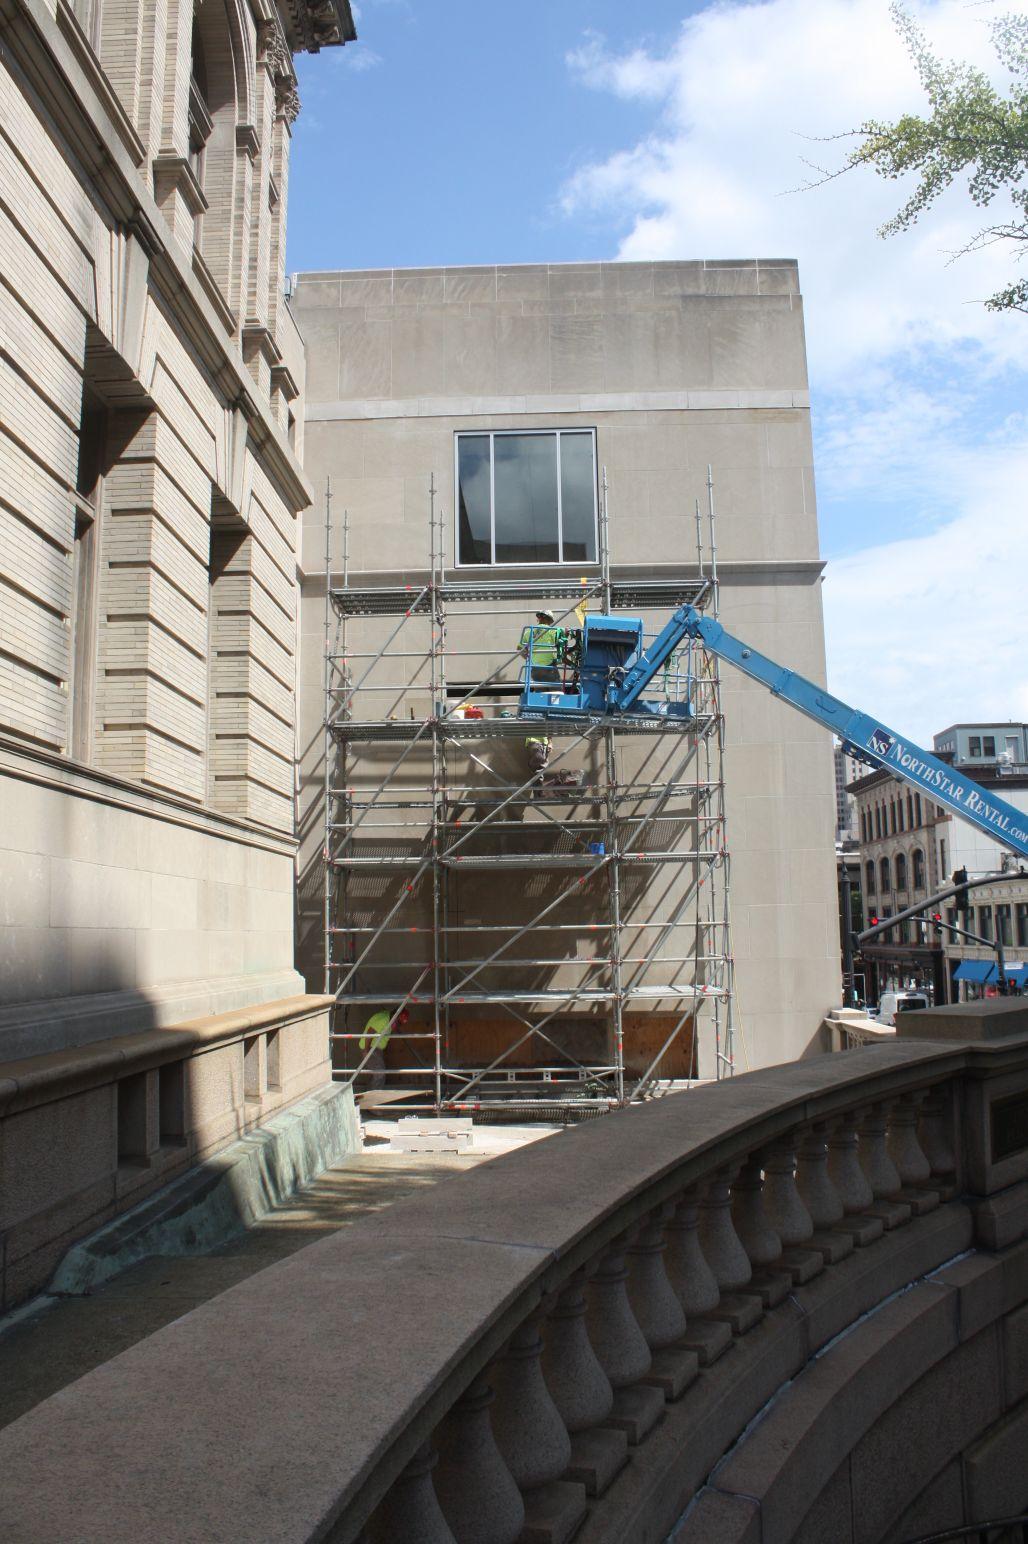 Washington St Window CutWashington St Window Cut